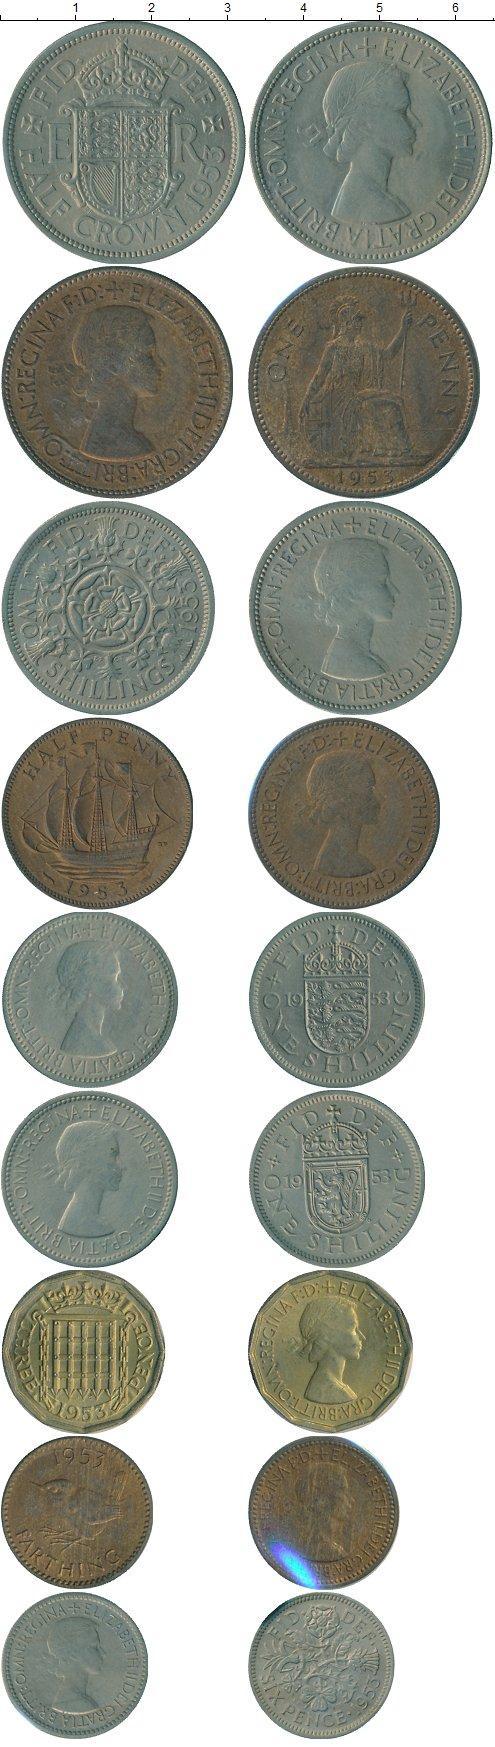 Каталог монет - Великобритания Великобритания 1953